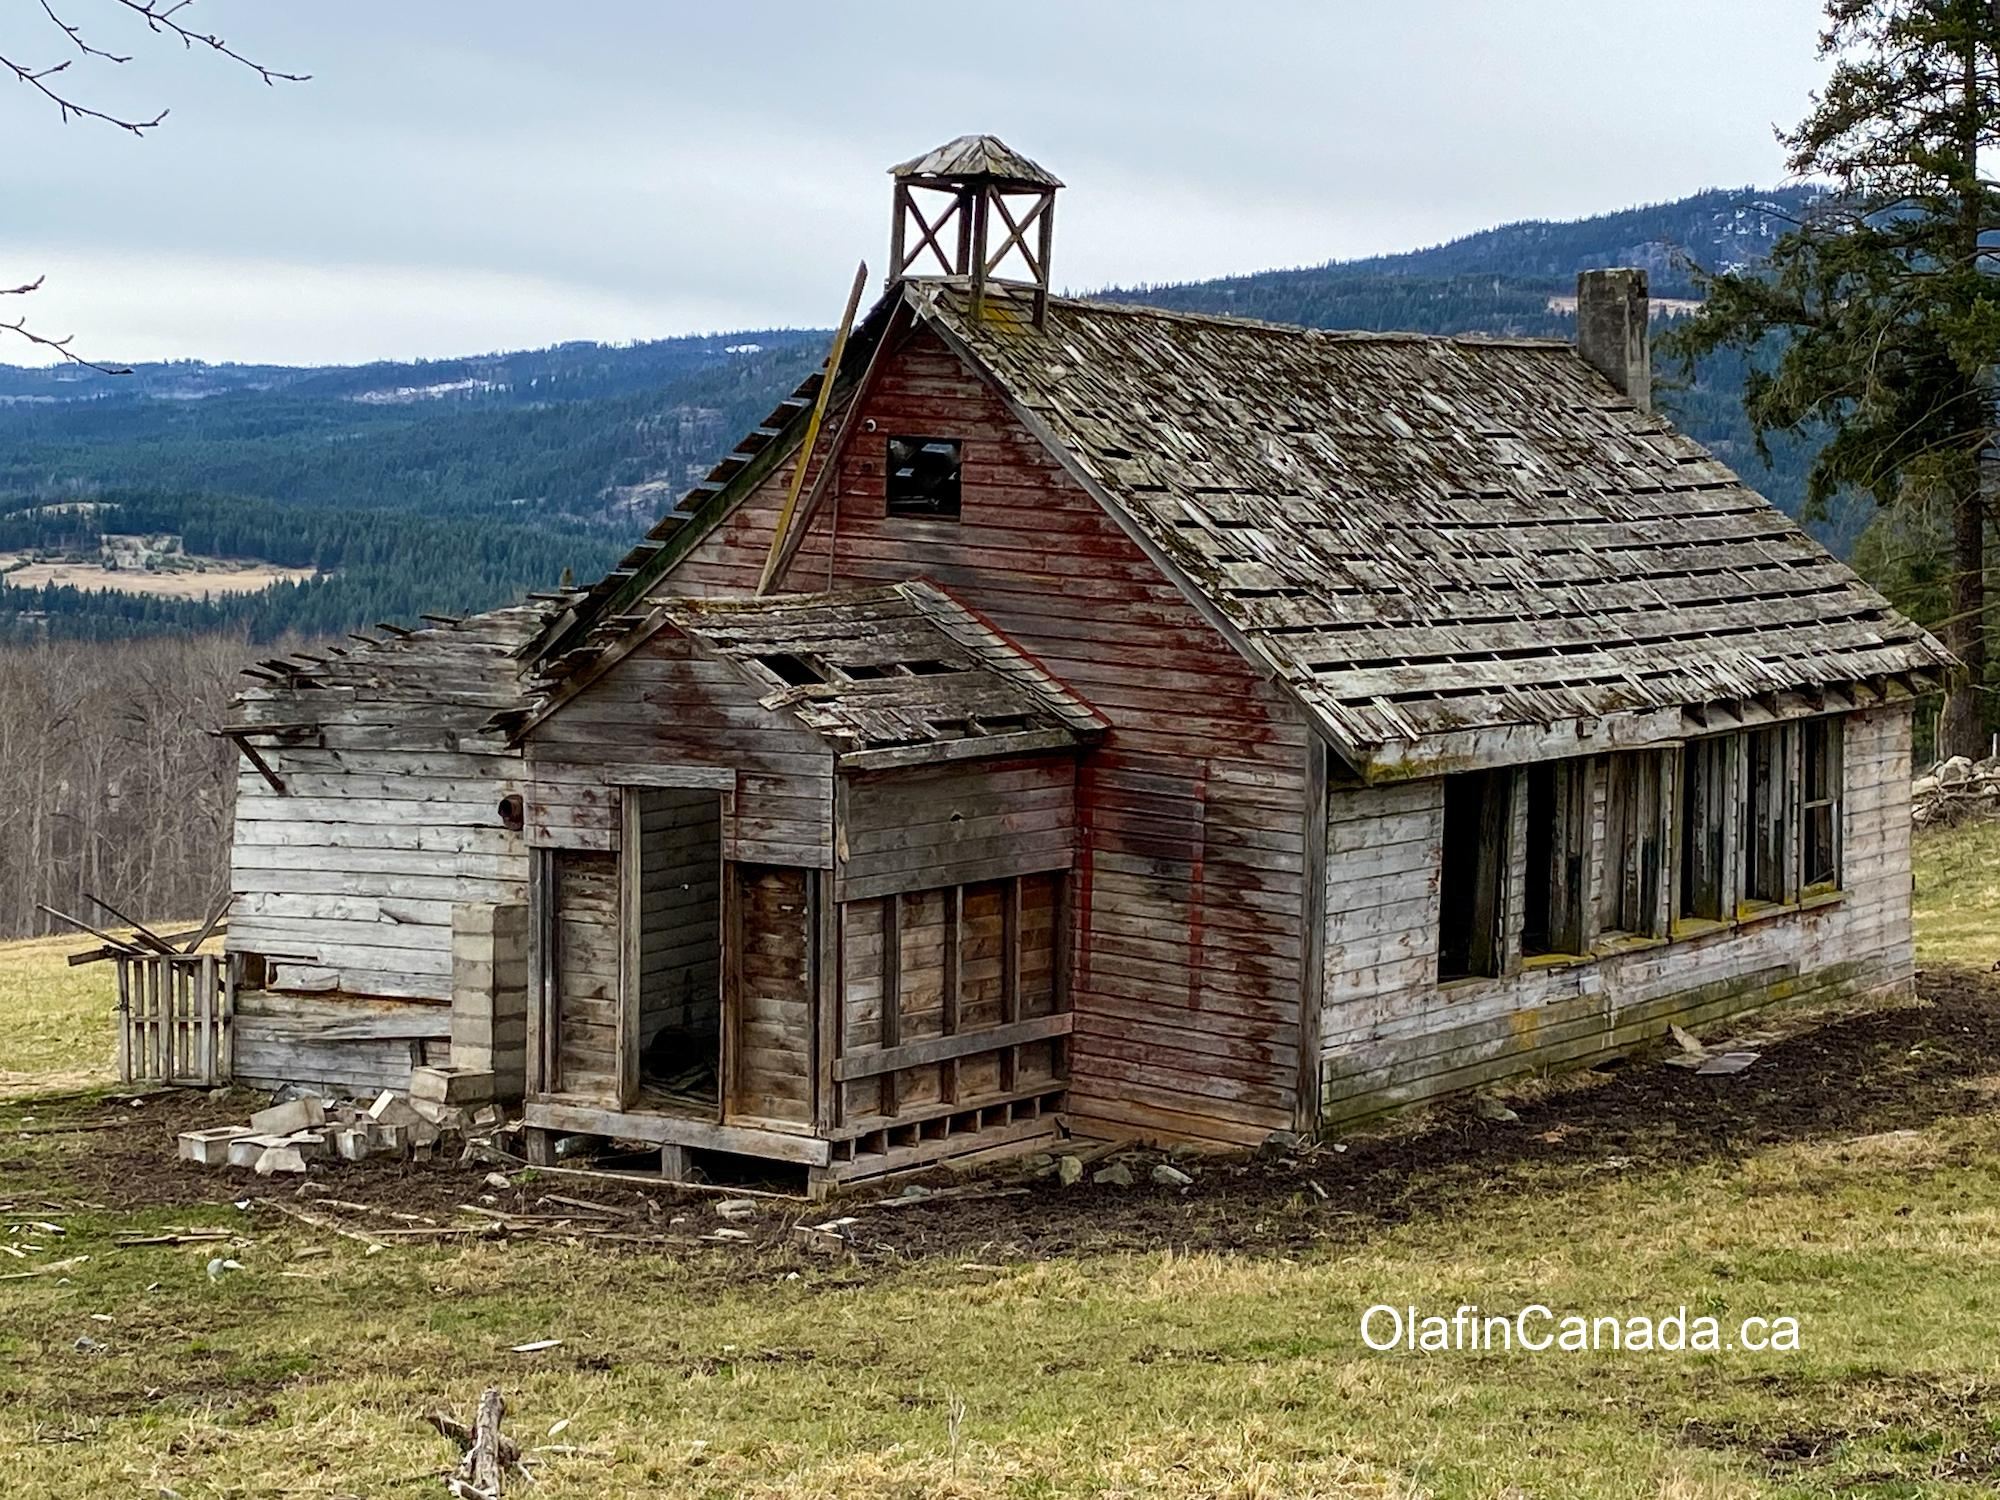 Small school in Chu Chua on Dunn Lake Road #olafincanada #britishcolumbia #discoverbc #abandonedbc #school